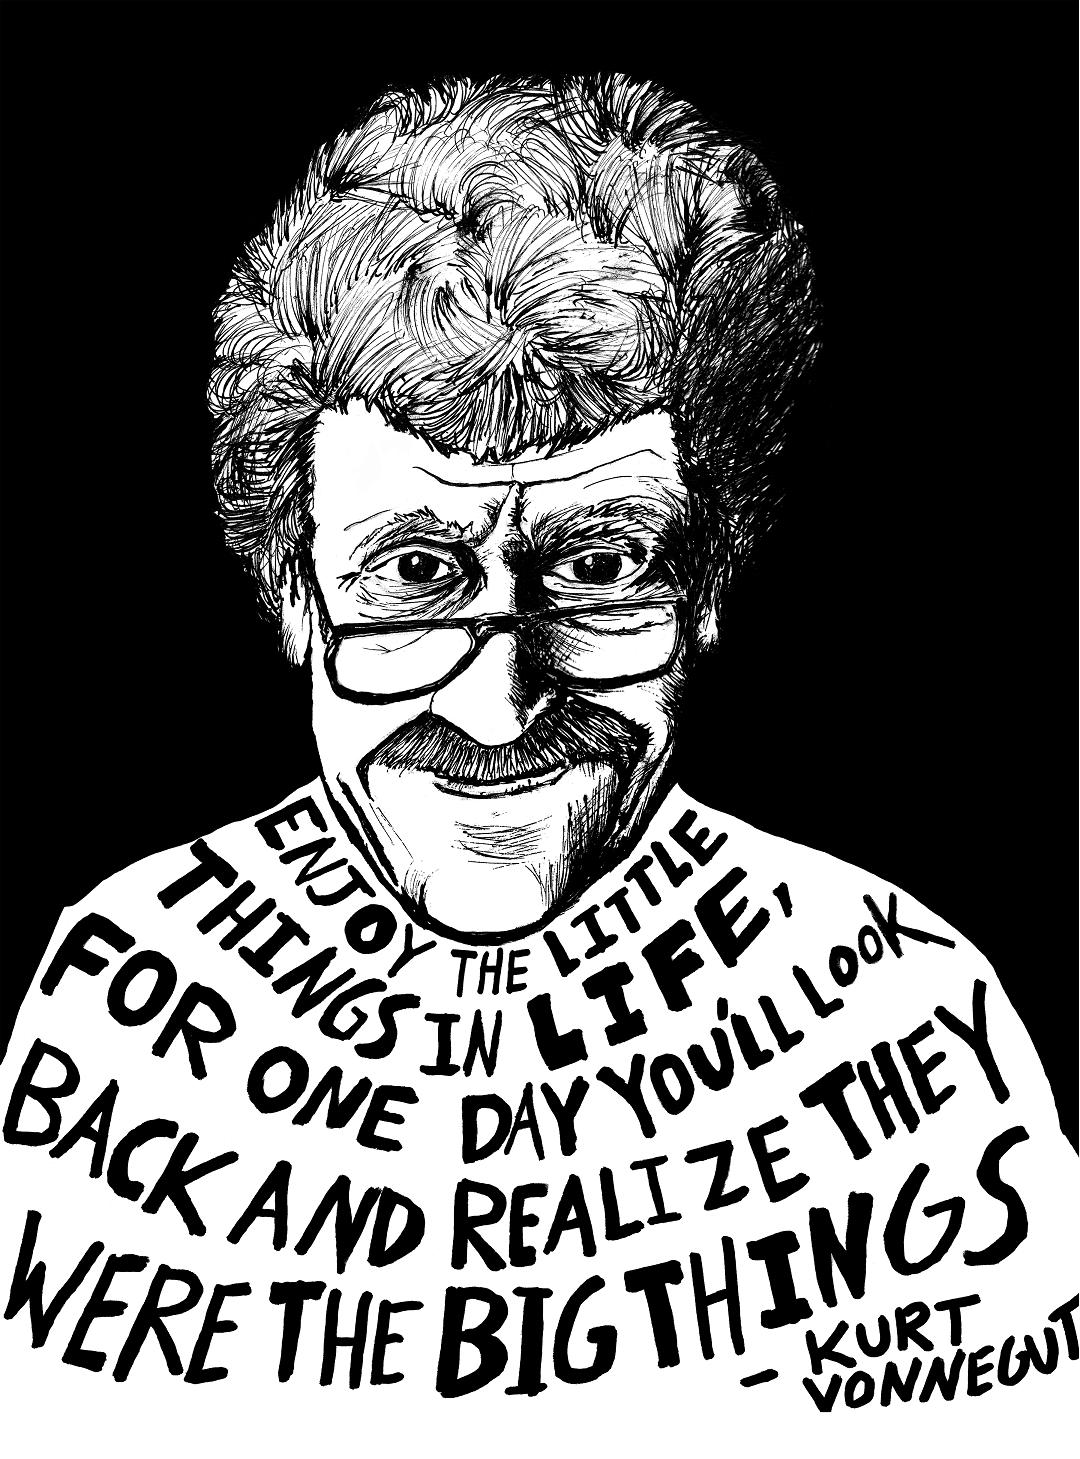 Kurt Vonnegut depicted in art by Ryan Sheffield